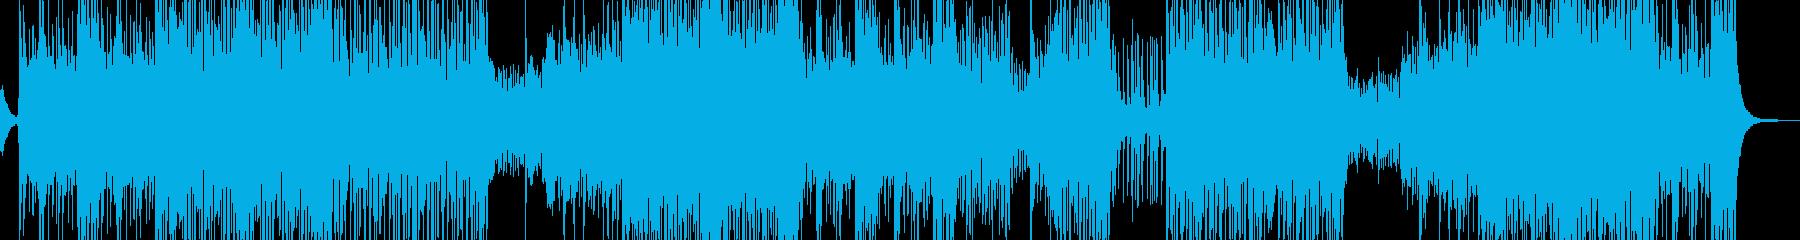 RPG・砂漠面を想定したBGM 長尺の再生済みの波形